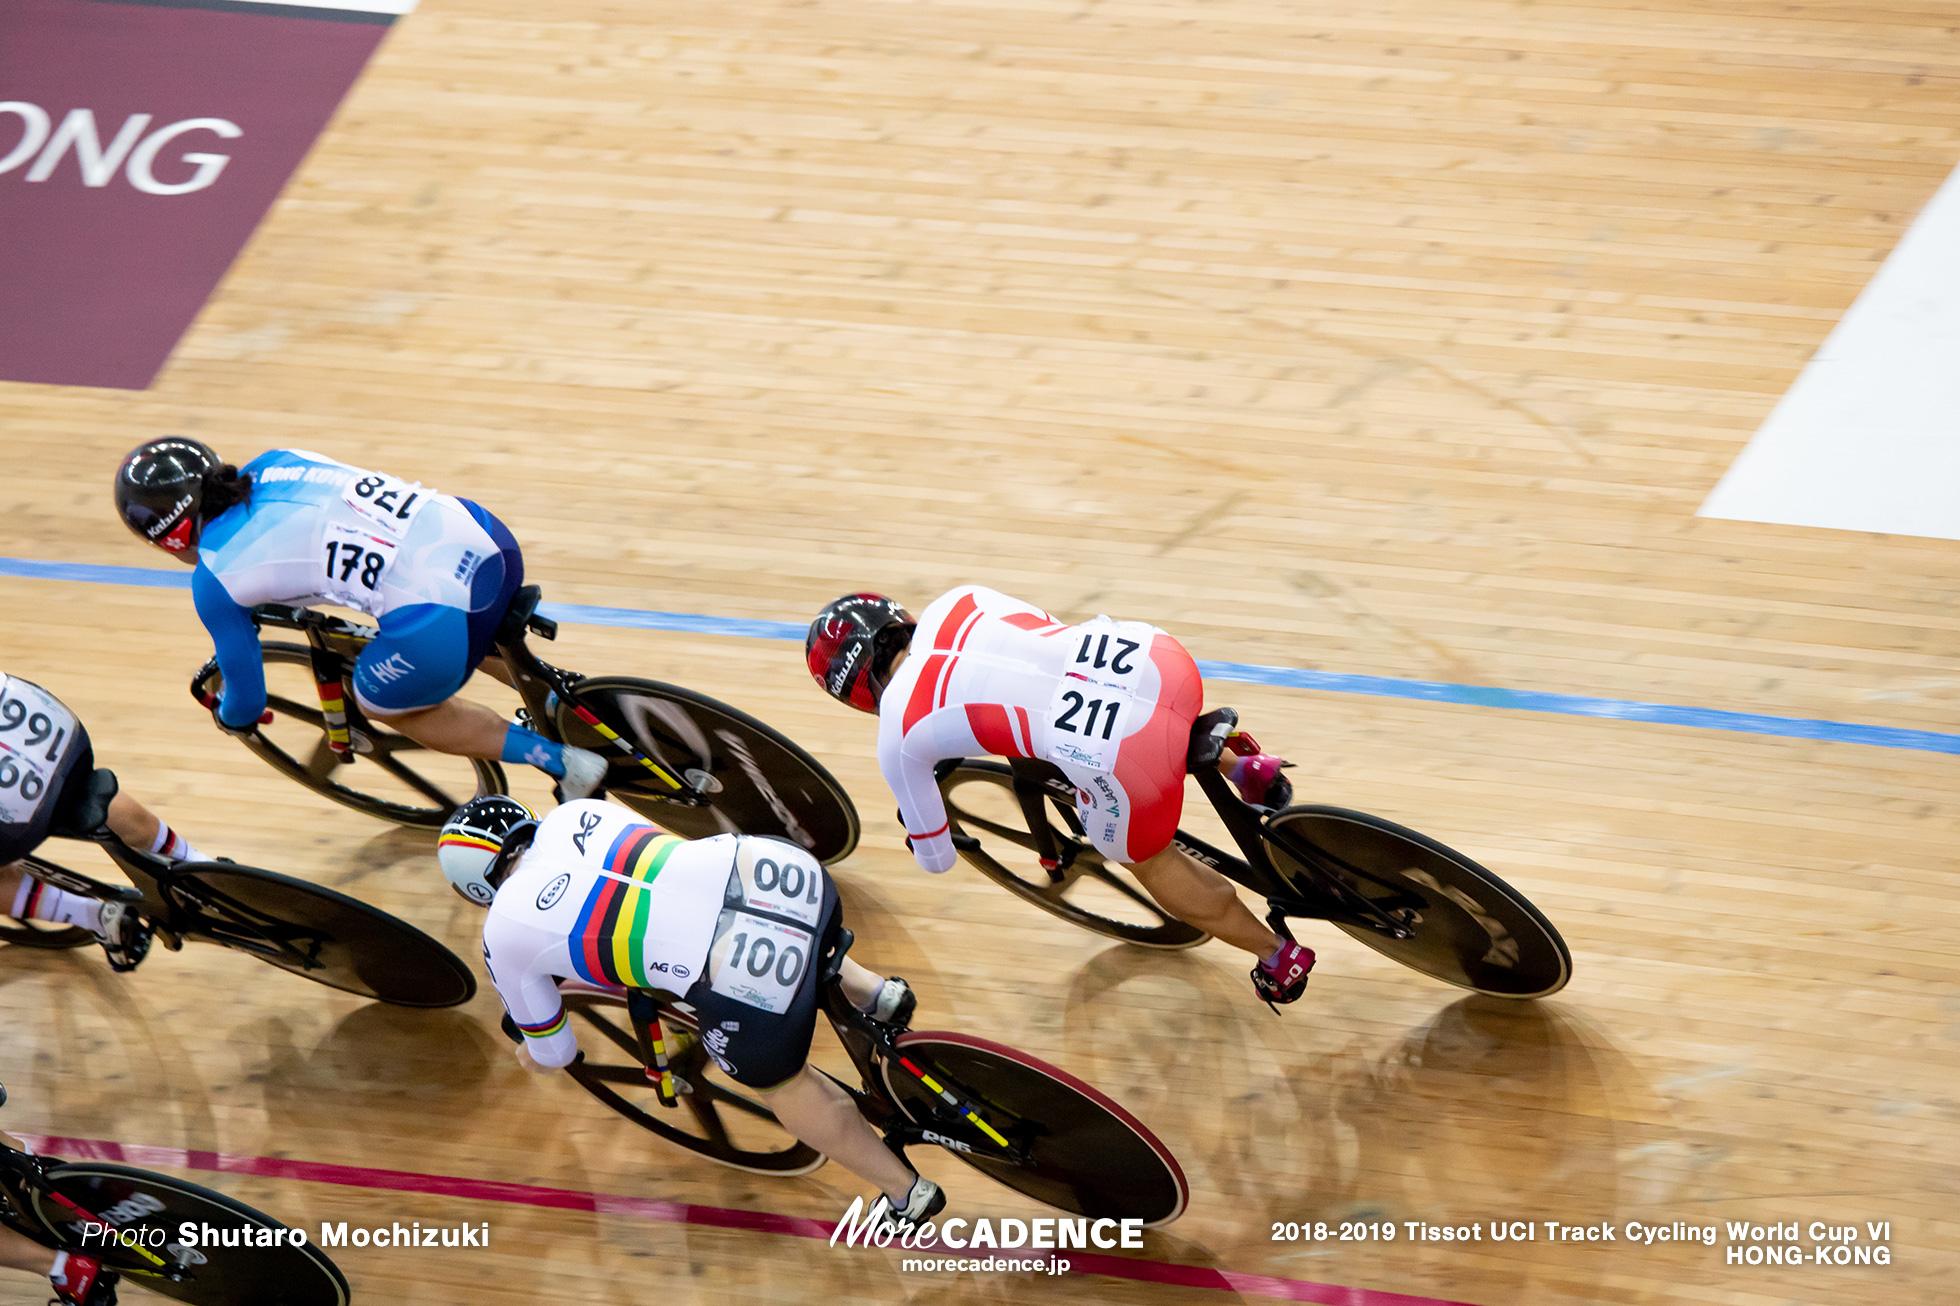 Final / Women's Keirin / Track Cycling World Cup VI / Hong-Kong